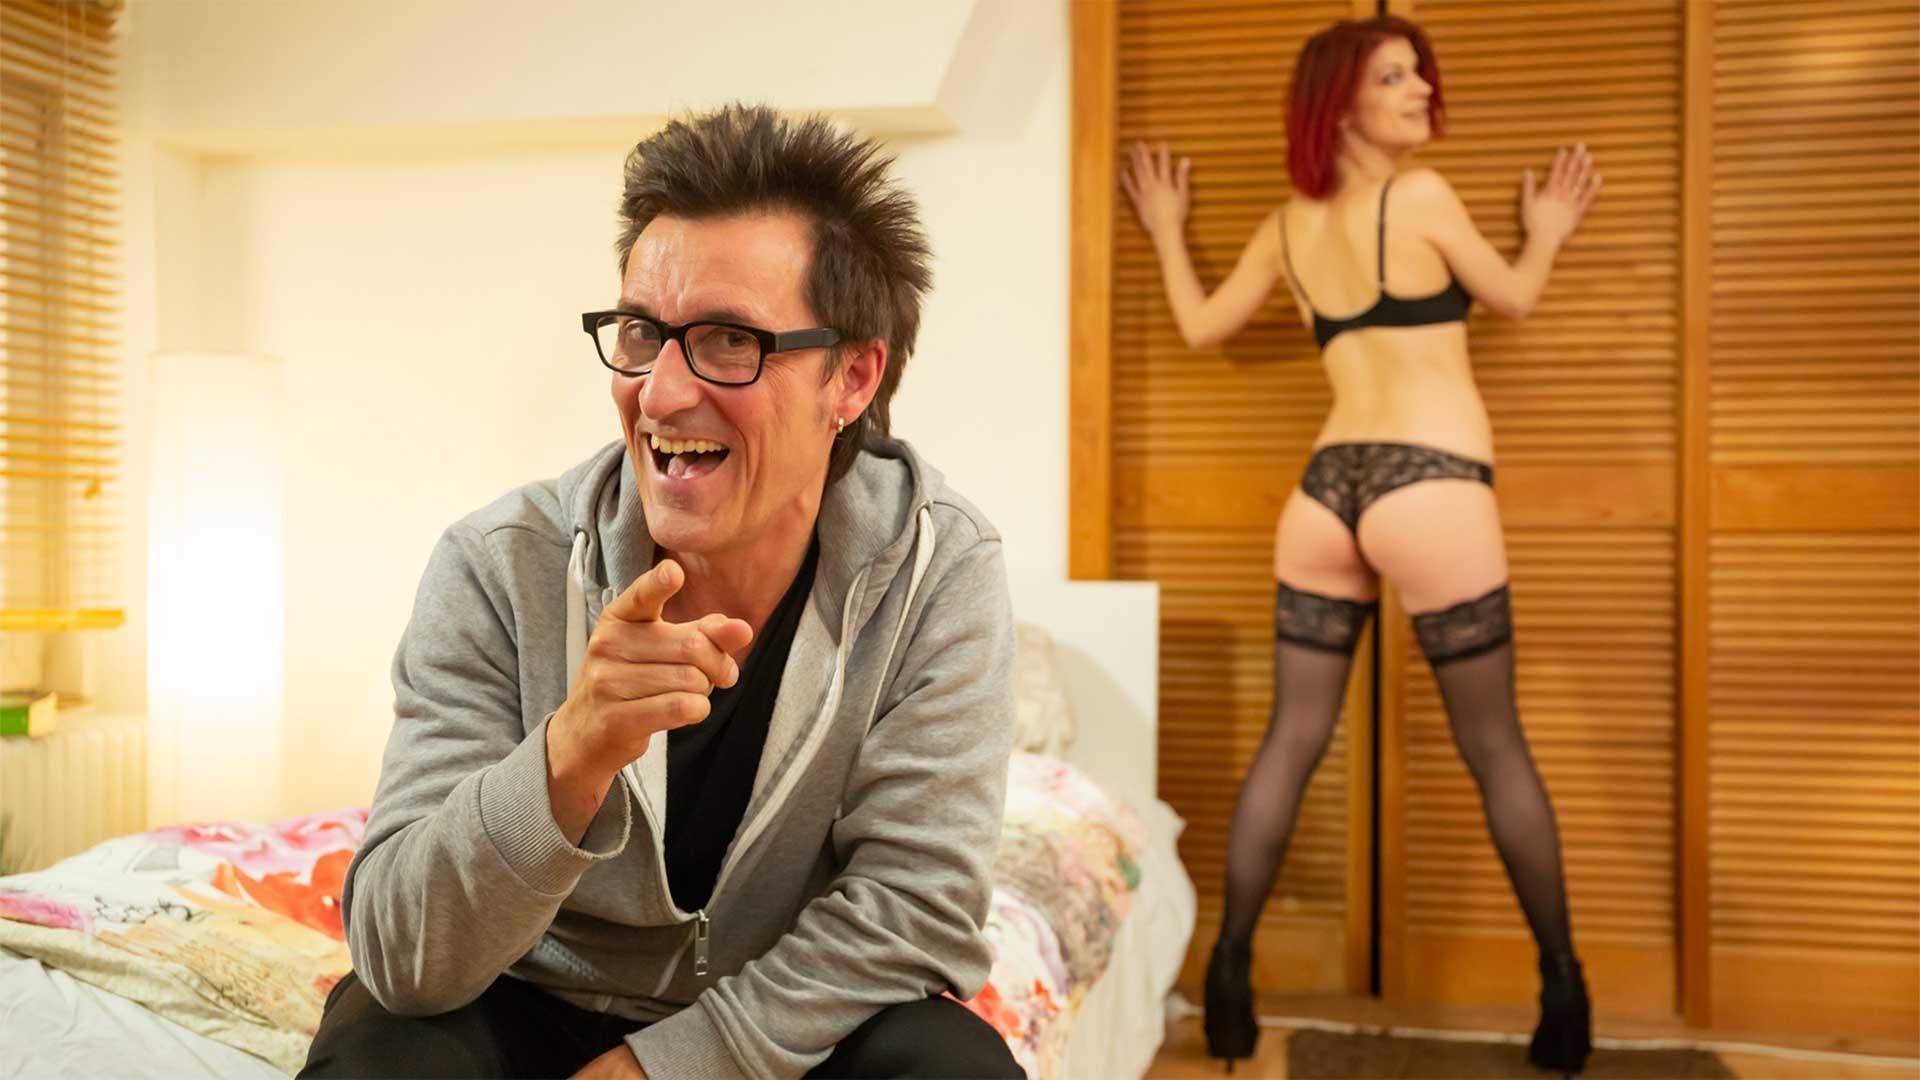 Lust Pur Conny der Hostelier Teil 1 • Beate-Uhse.TV